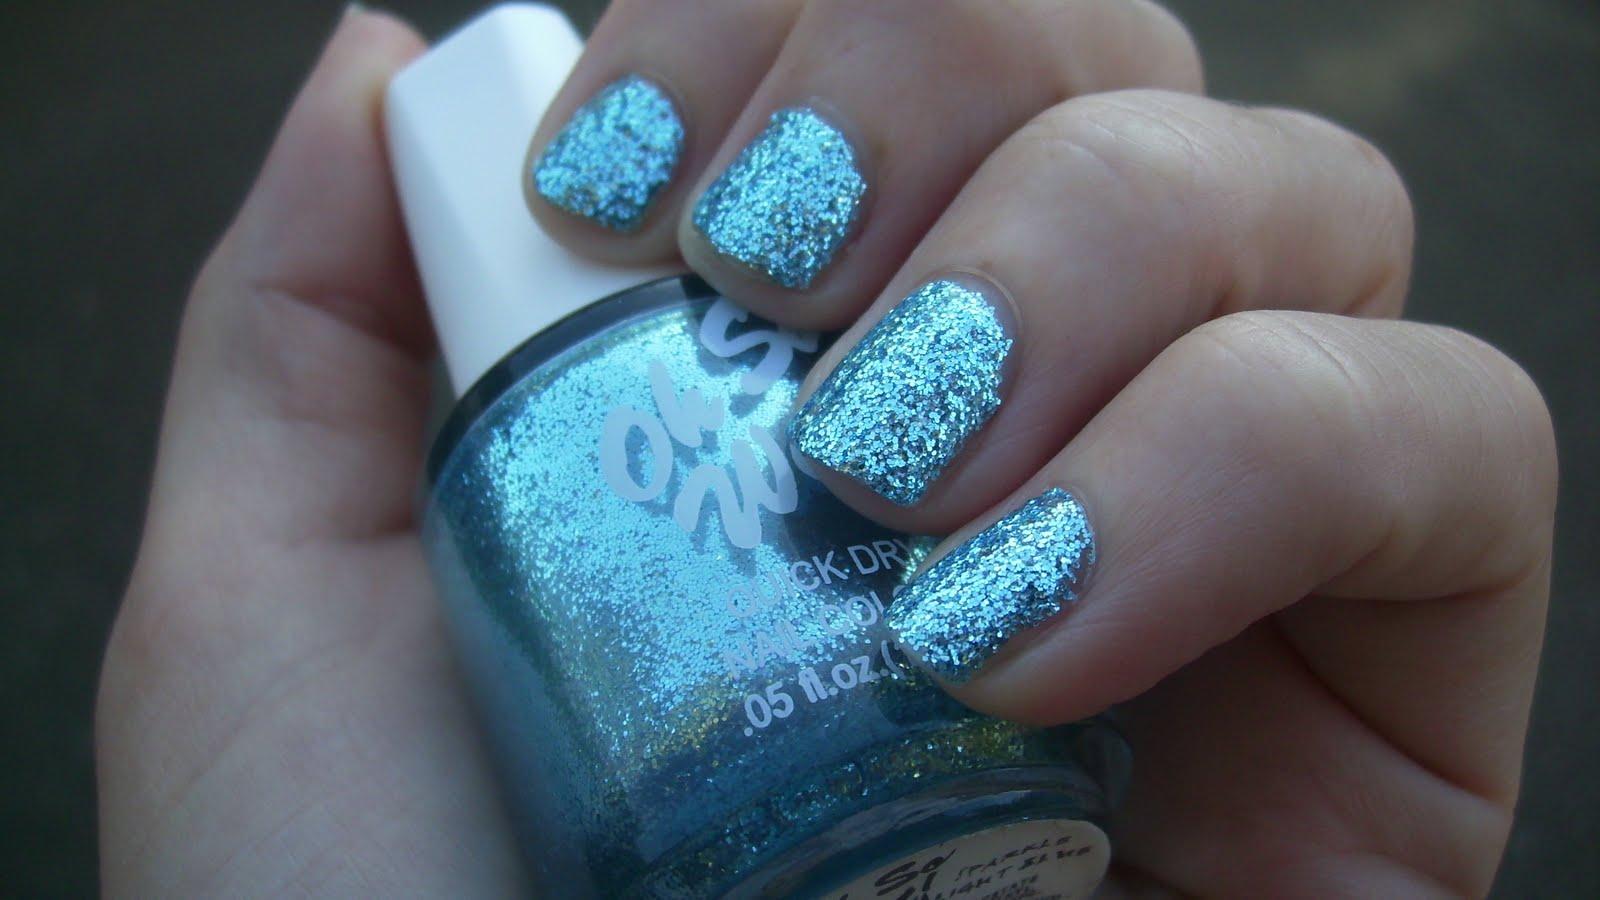 kitty luvs color!: oh so wet! nail polish, sparkle light blue